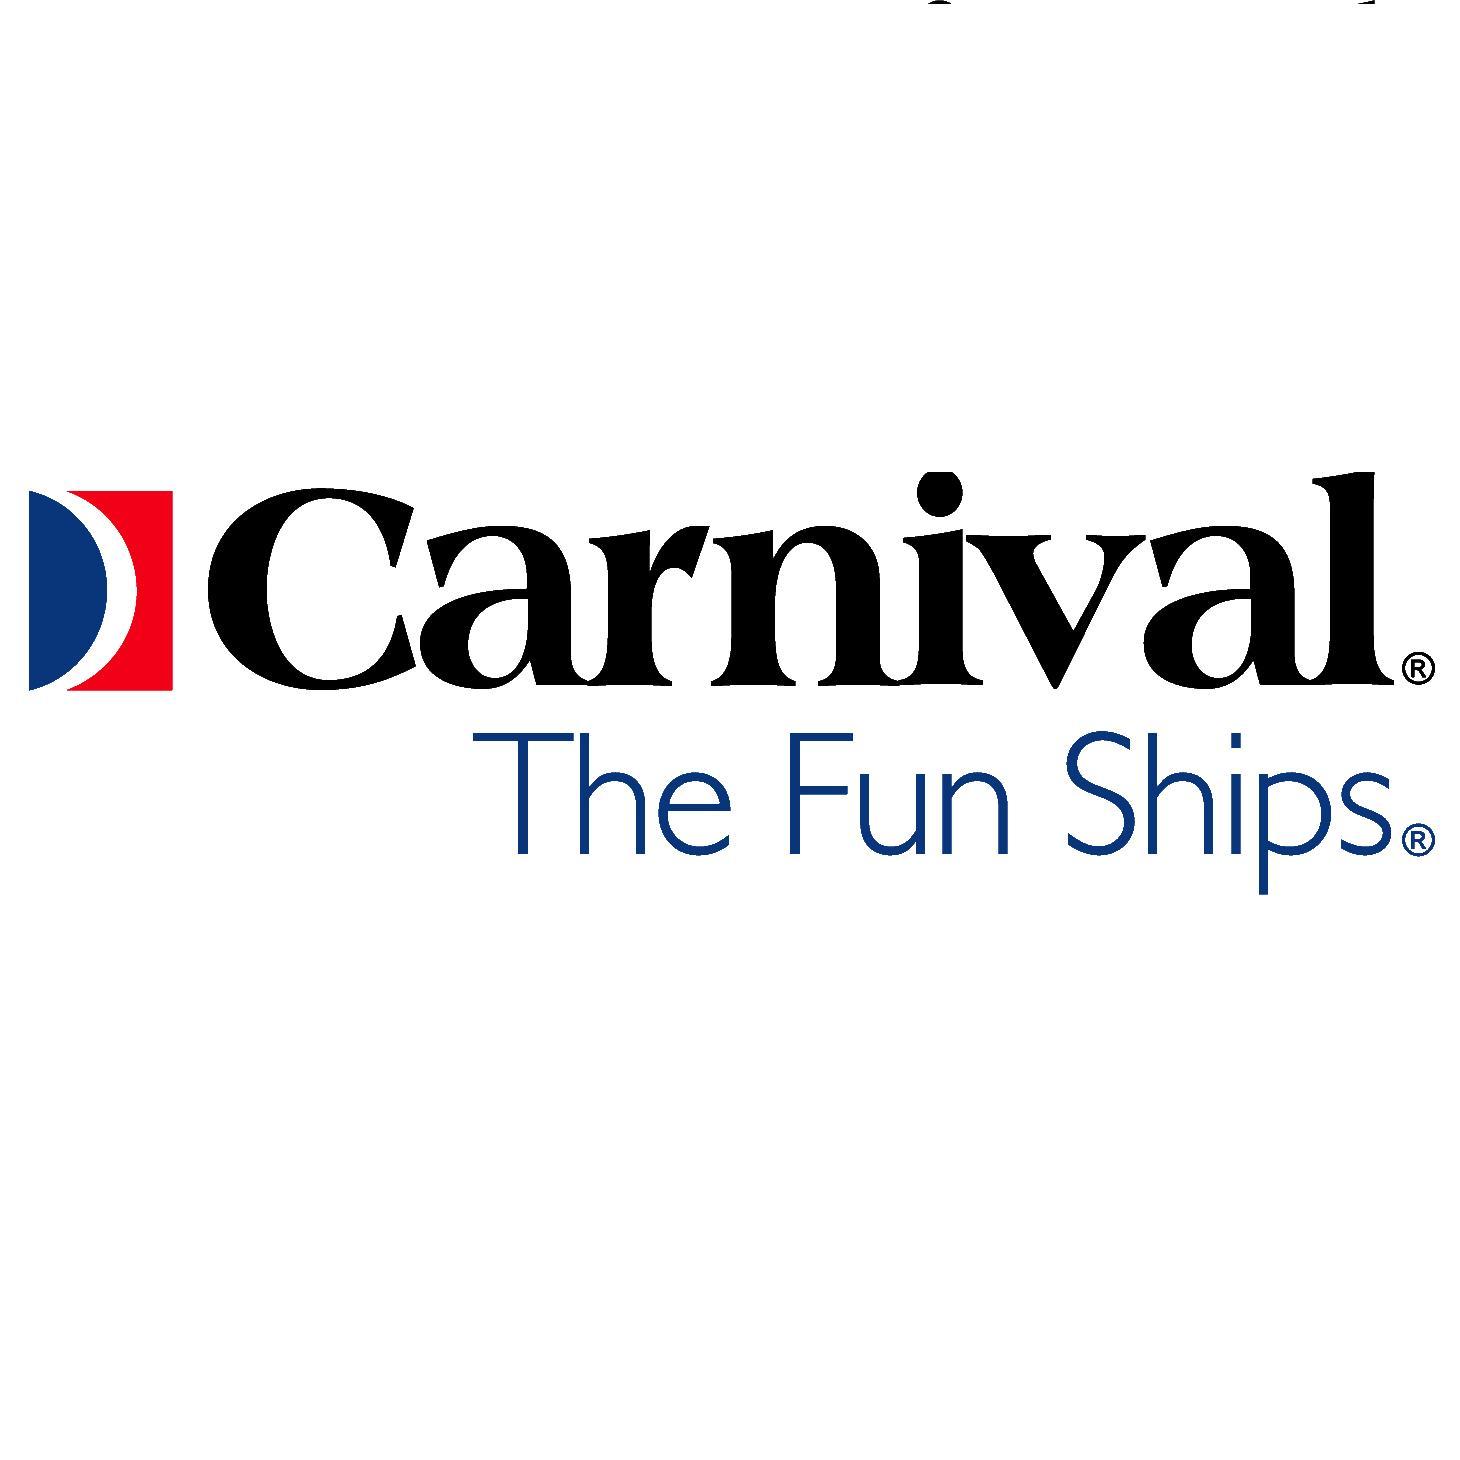 Carnival cruise line Logos.